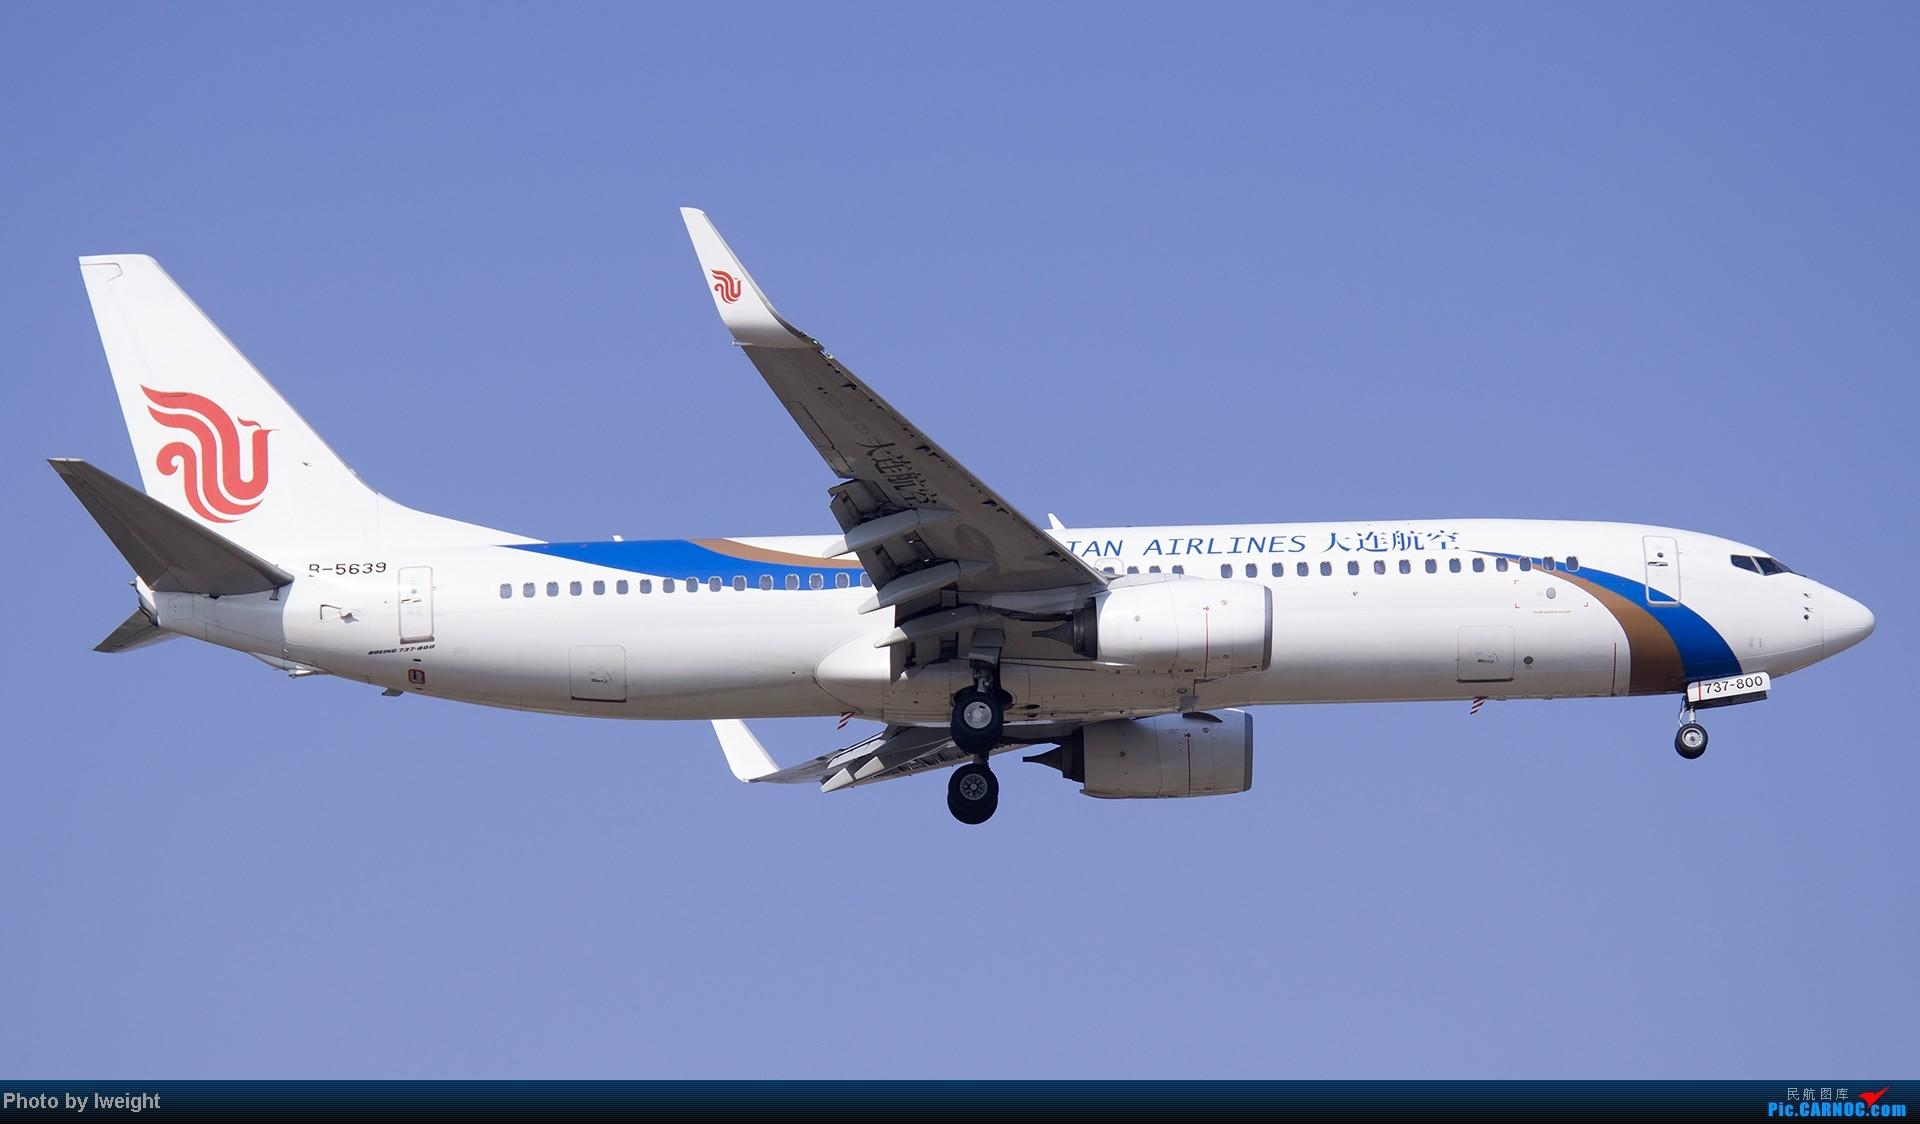 Re:[原创]北京难得的好天气,收获多种机型和彩绘,遗憾的是再次错过卡航巴塞罗那彩绘 BOEING 737-800 B-5639 中国北京首都机场